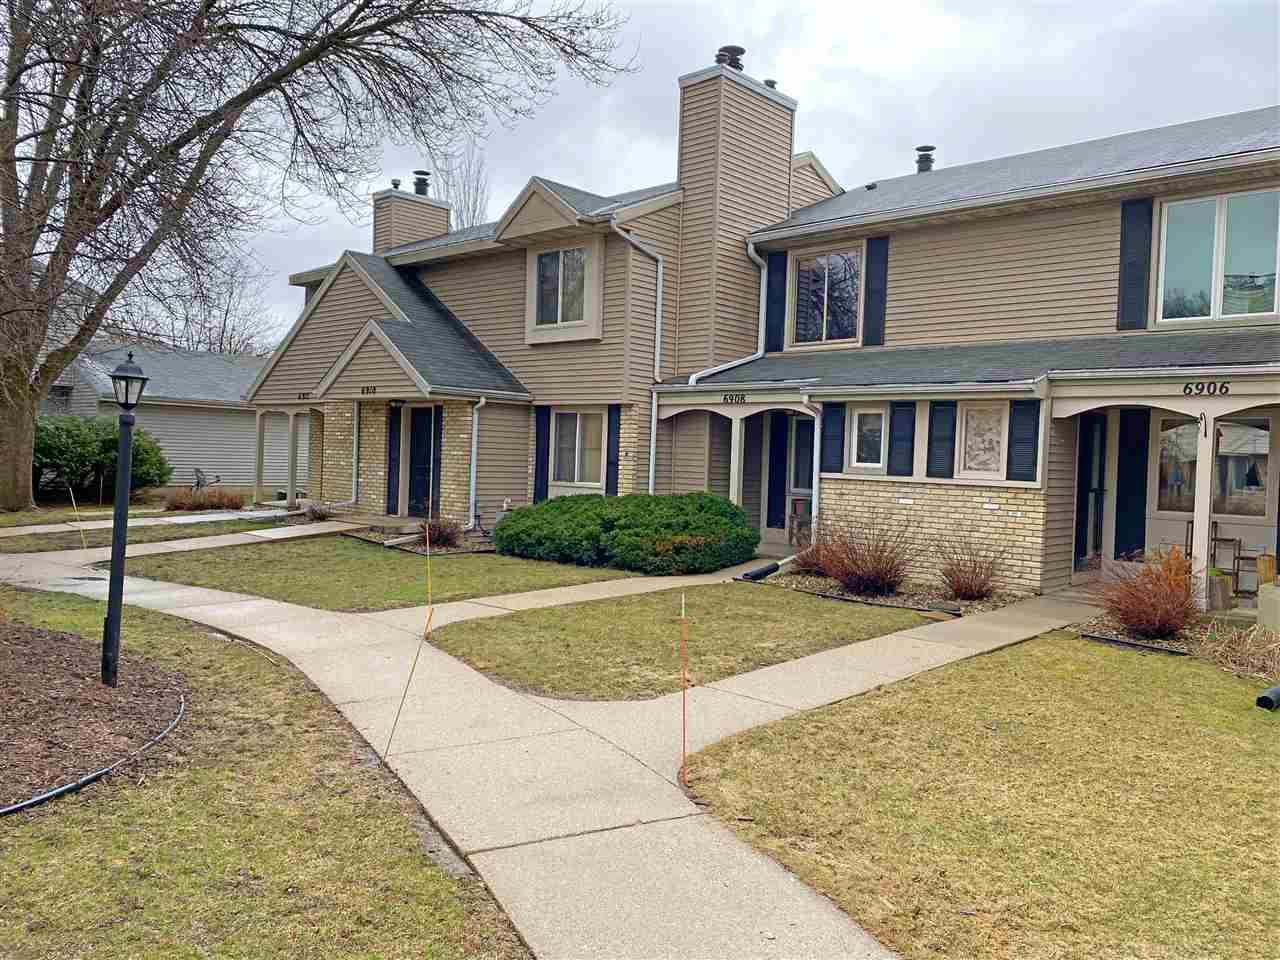 6908 Park Ridge Dr, MADISON, Wisconsin 53719, 2 Bedrooms Bedrooms, ,2 BathroomsBathrooms,Townhouse,For Sale,6908 Park Ridge Dr,1904848